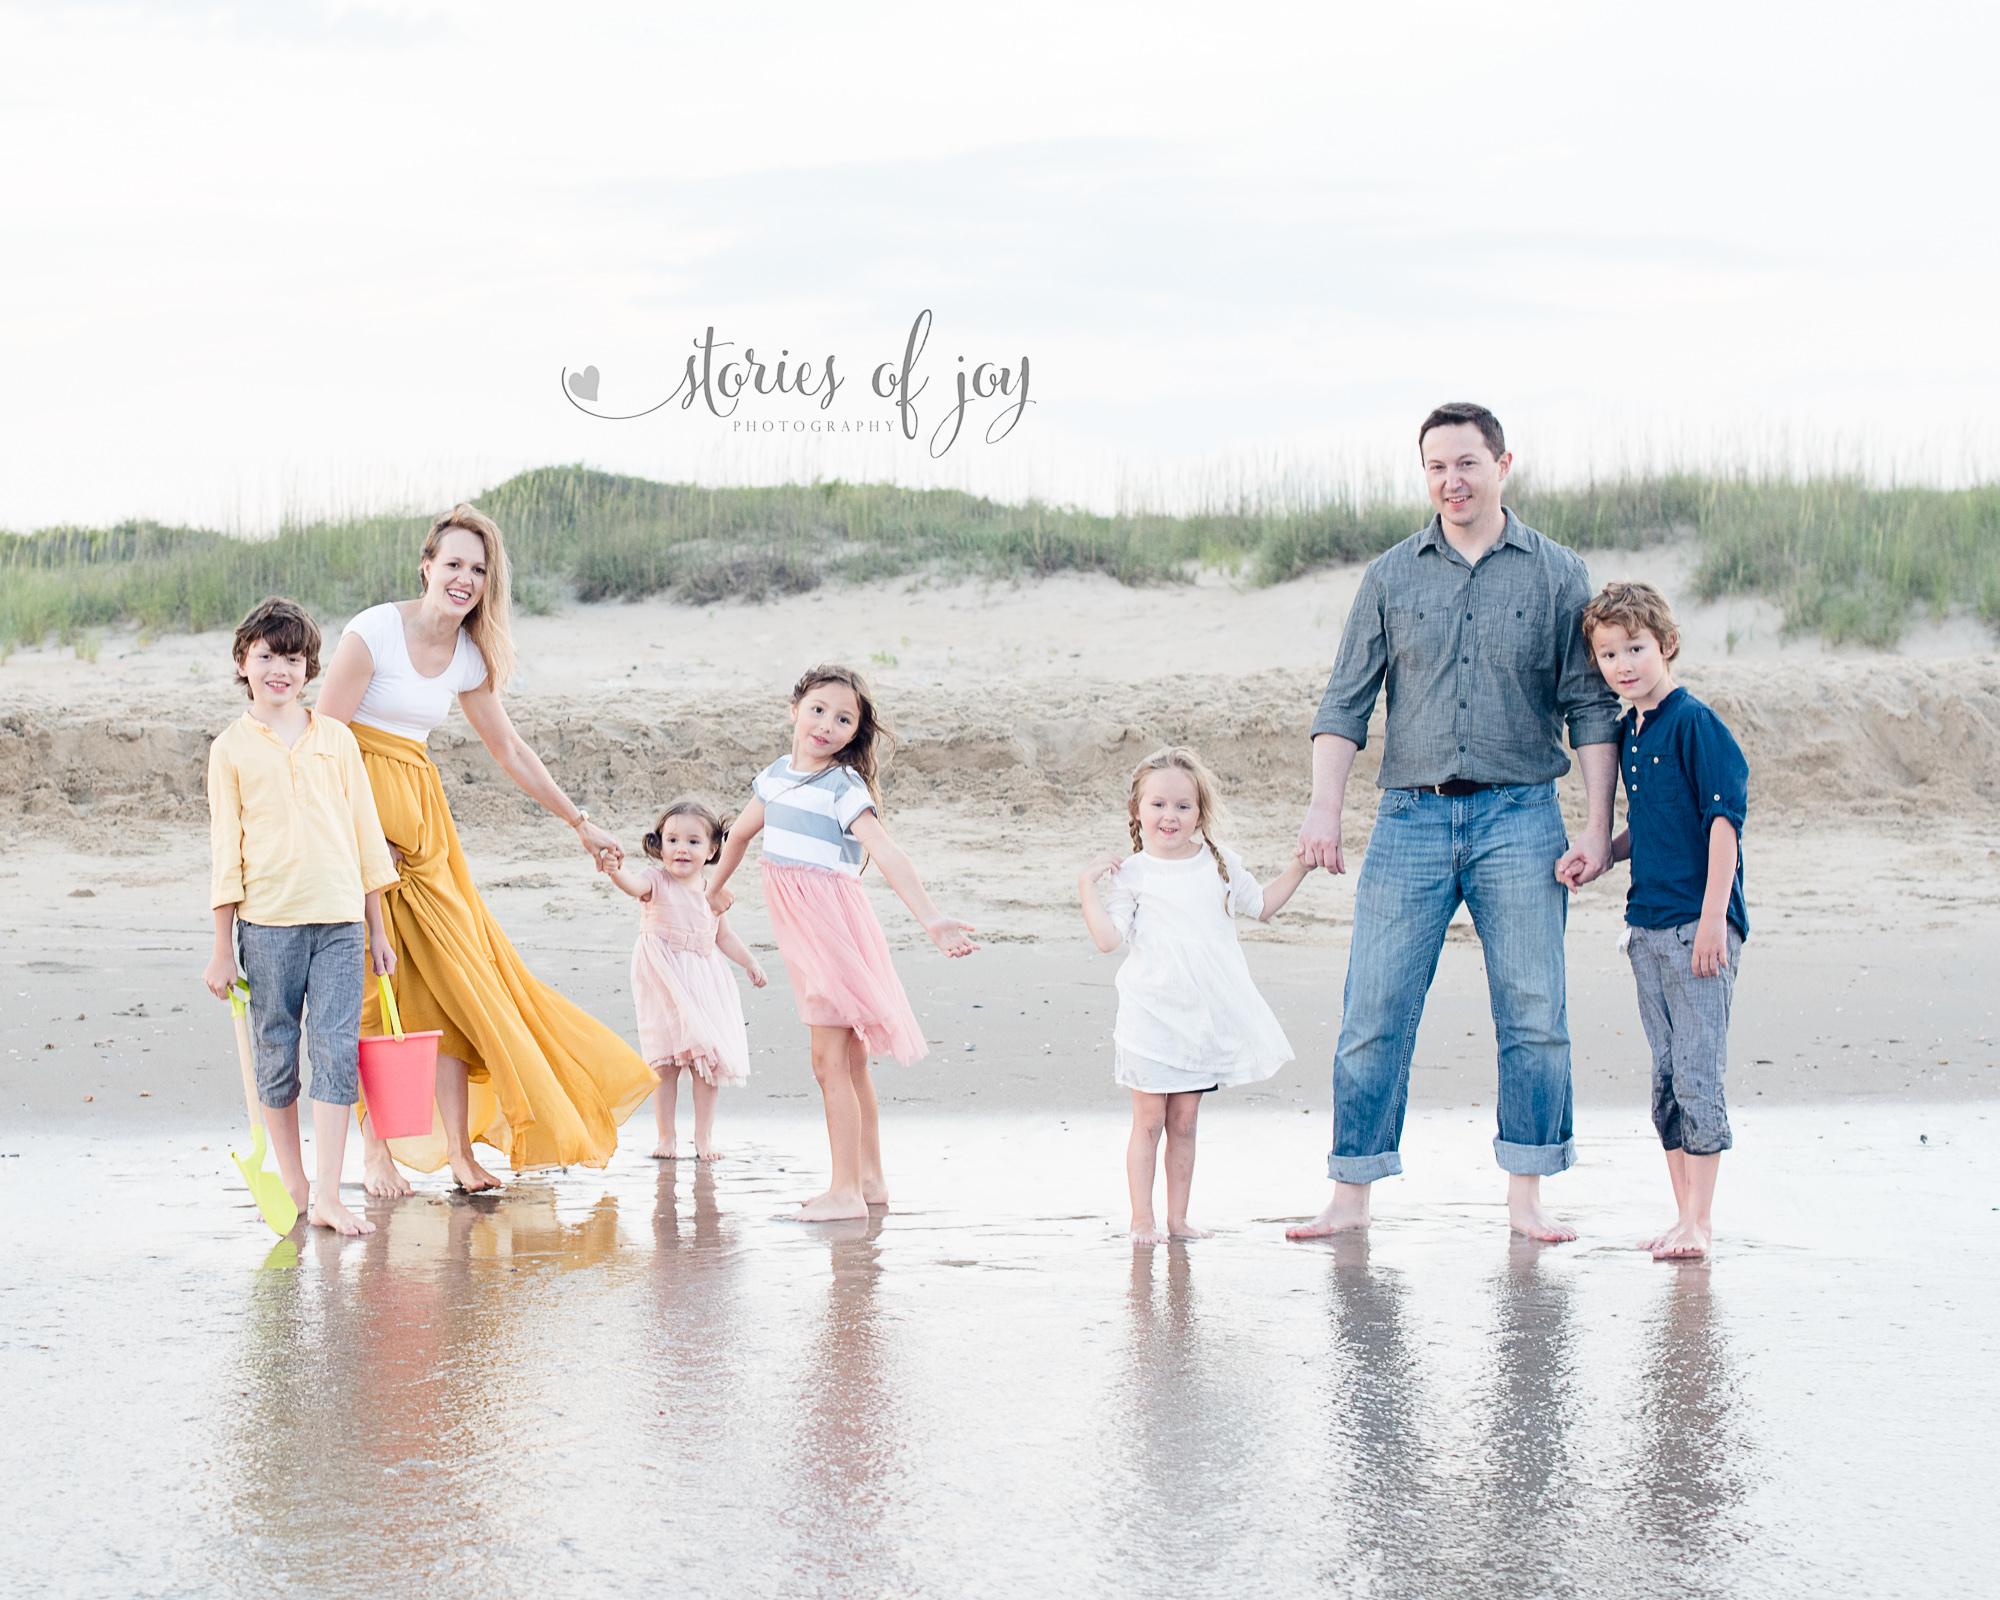 vero-beach-family-photo-session-1-8.jpg